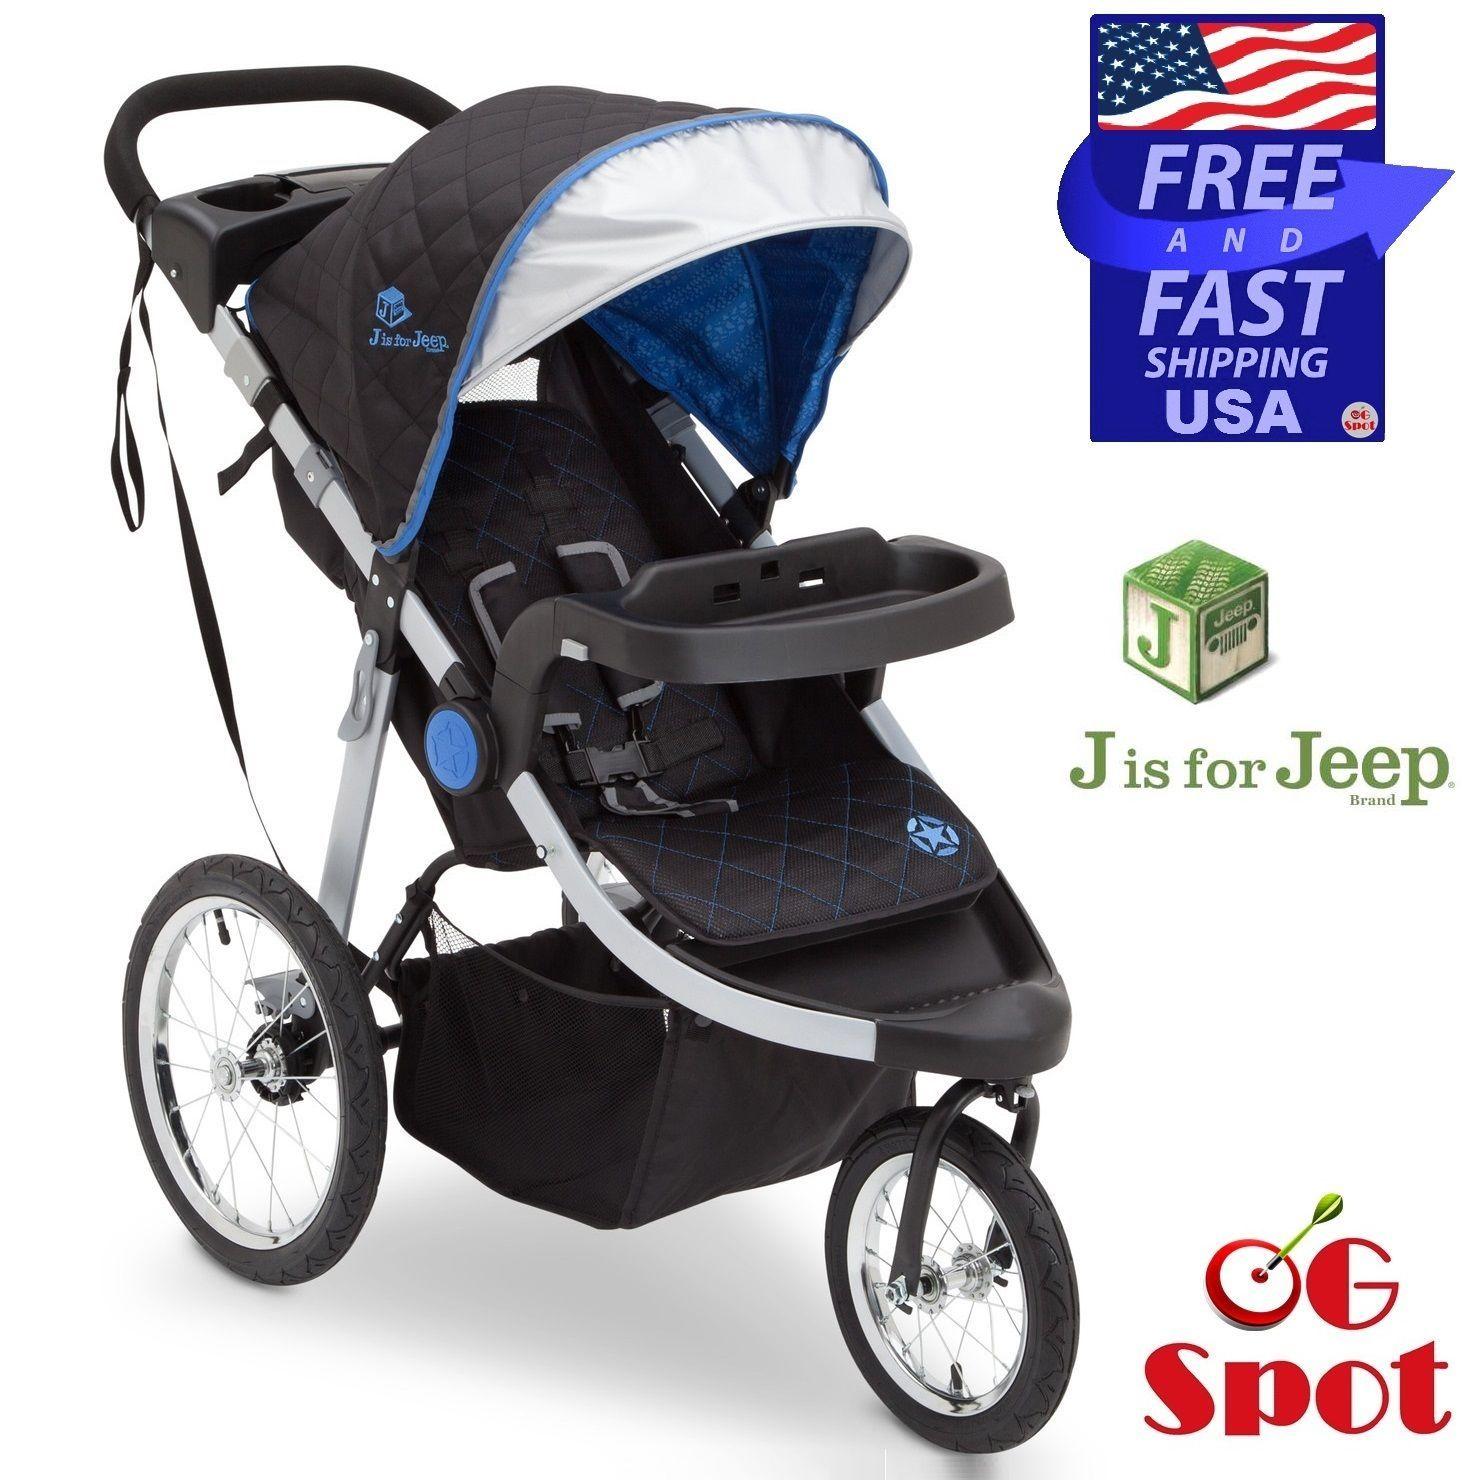 Jeep Baby Jogging Running Stroller 3 Wheel Cross Country All Terrain